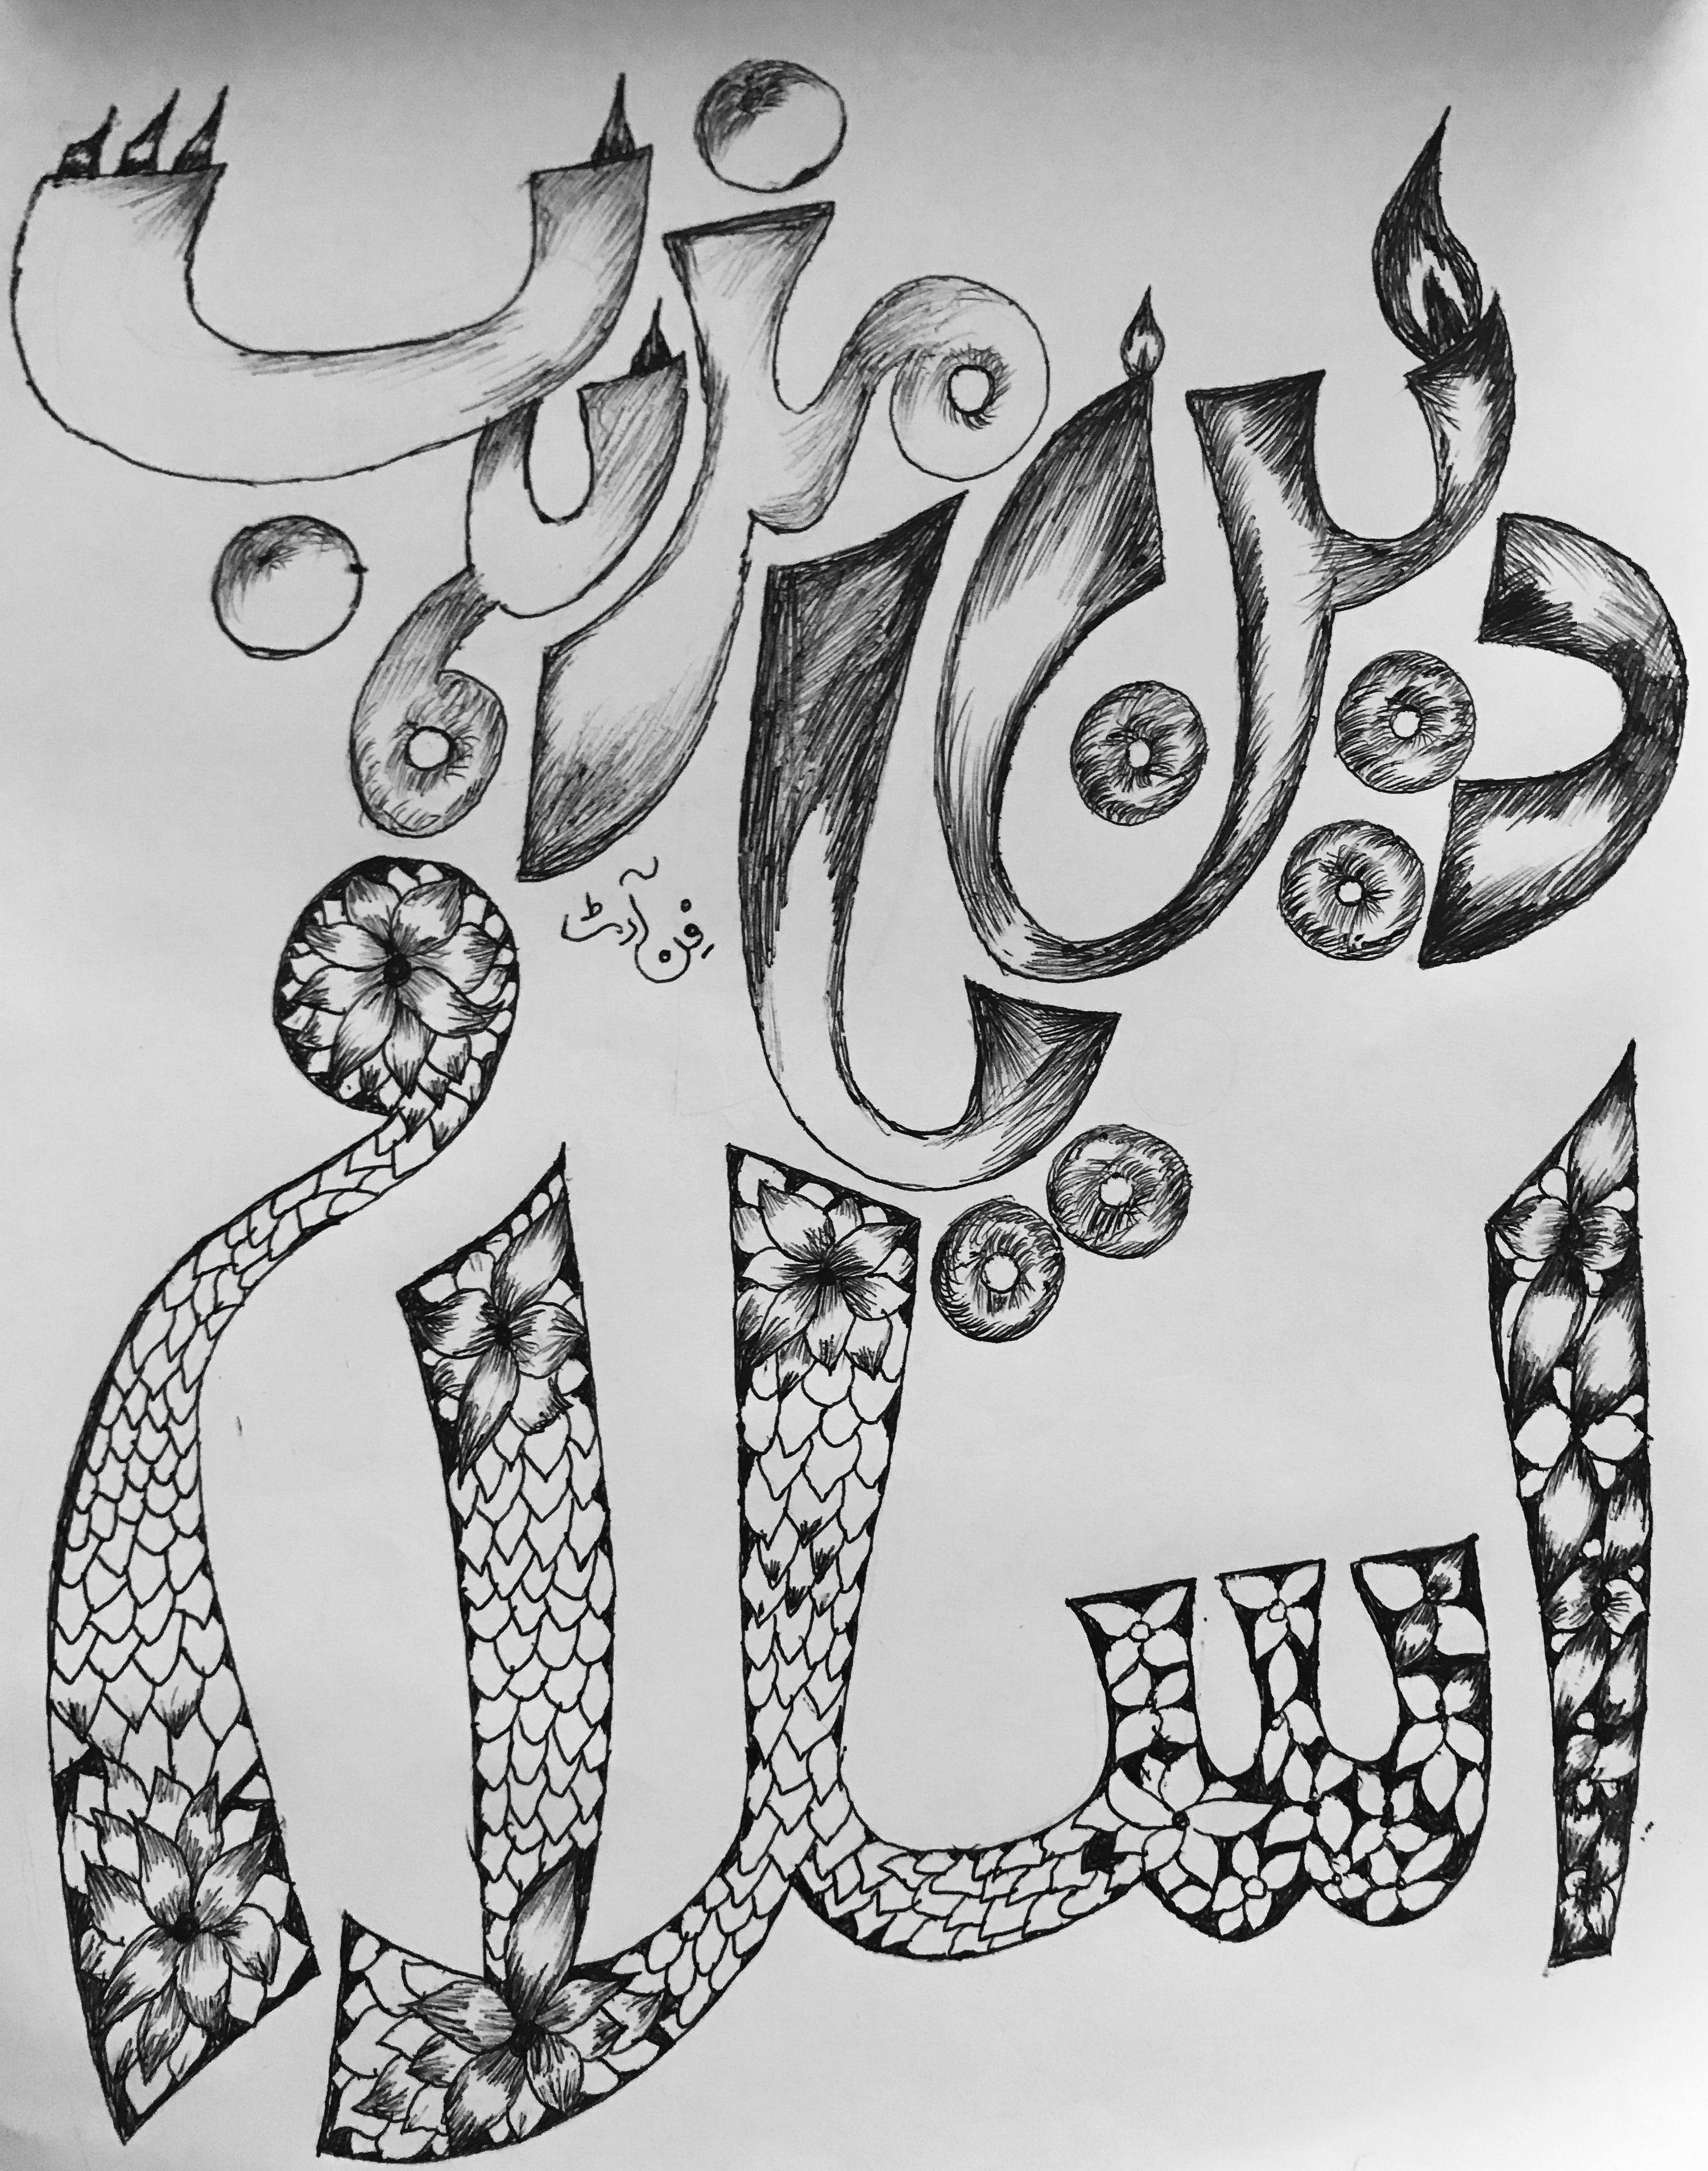 Islamic Art   Calligraphy   Pinterest   Islamic art and Calligraphy